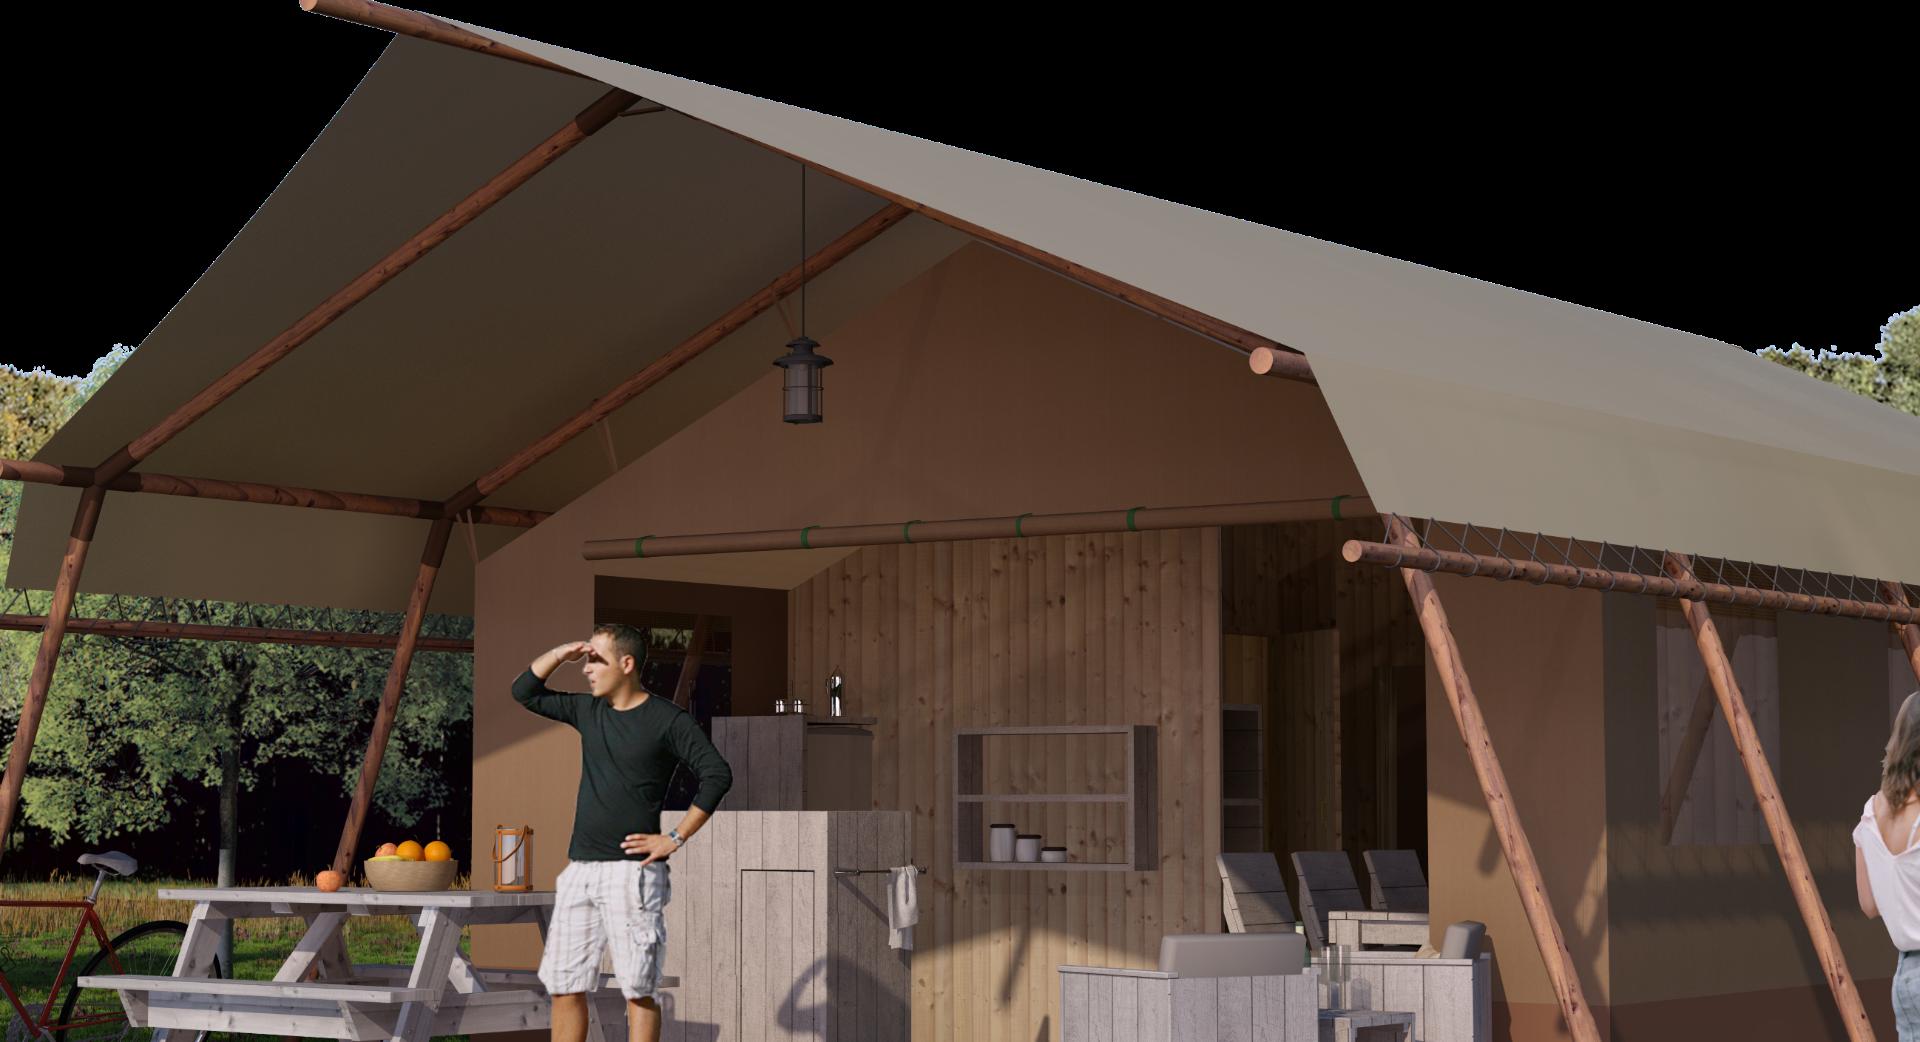 onderlegger-buiten-translucenty dak5% en binnendak LEM2.png